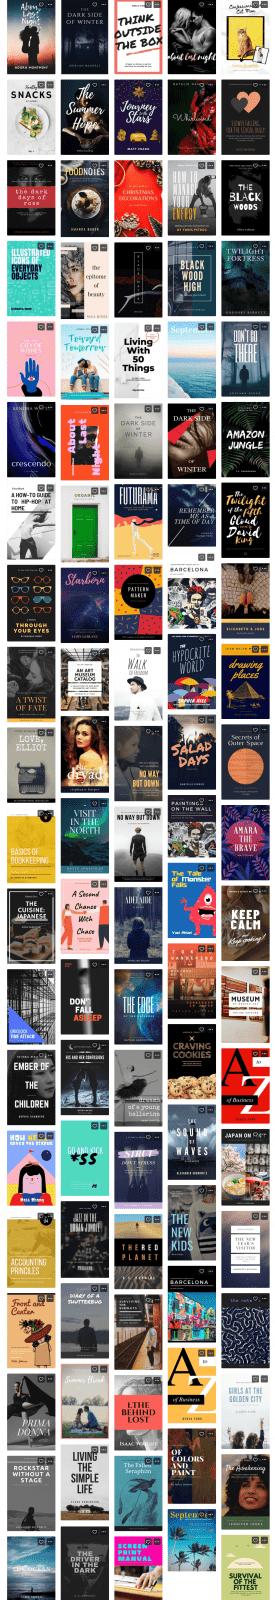 Ebook Covers-min